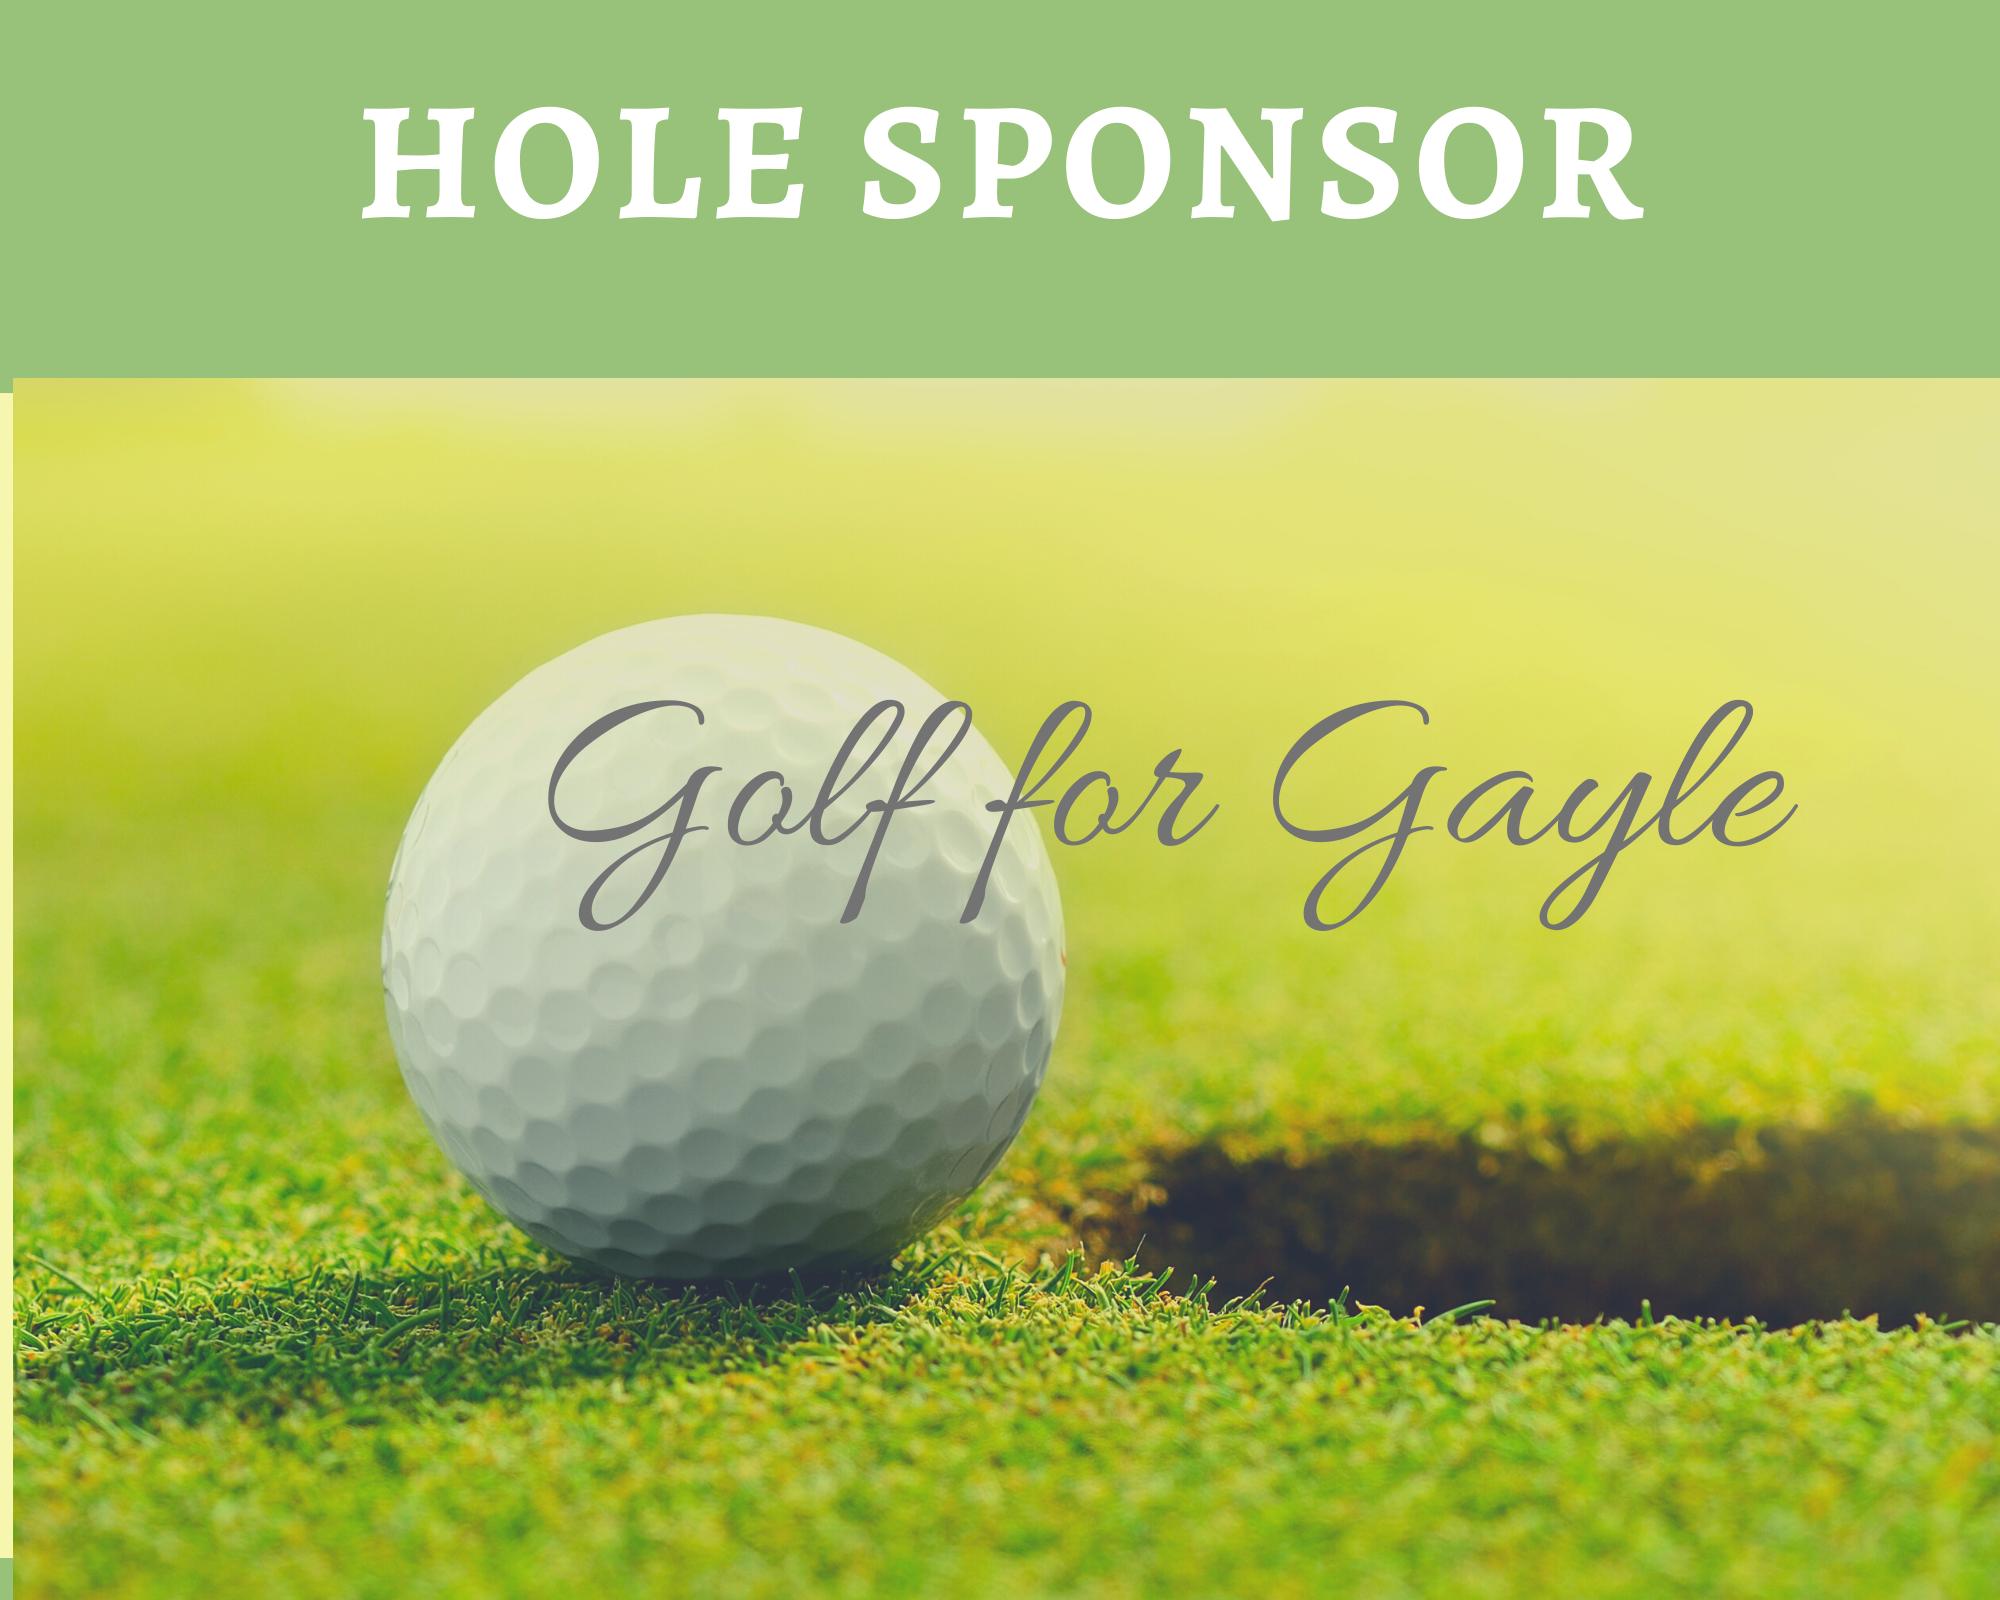 Gayle Newgren Charity Golf Tournament 2021 - Default Image of Hole Sponsor